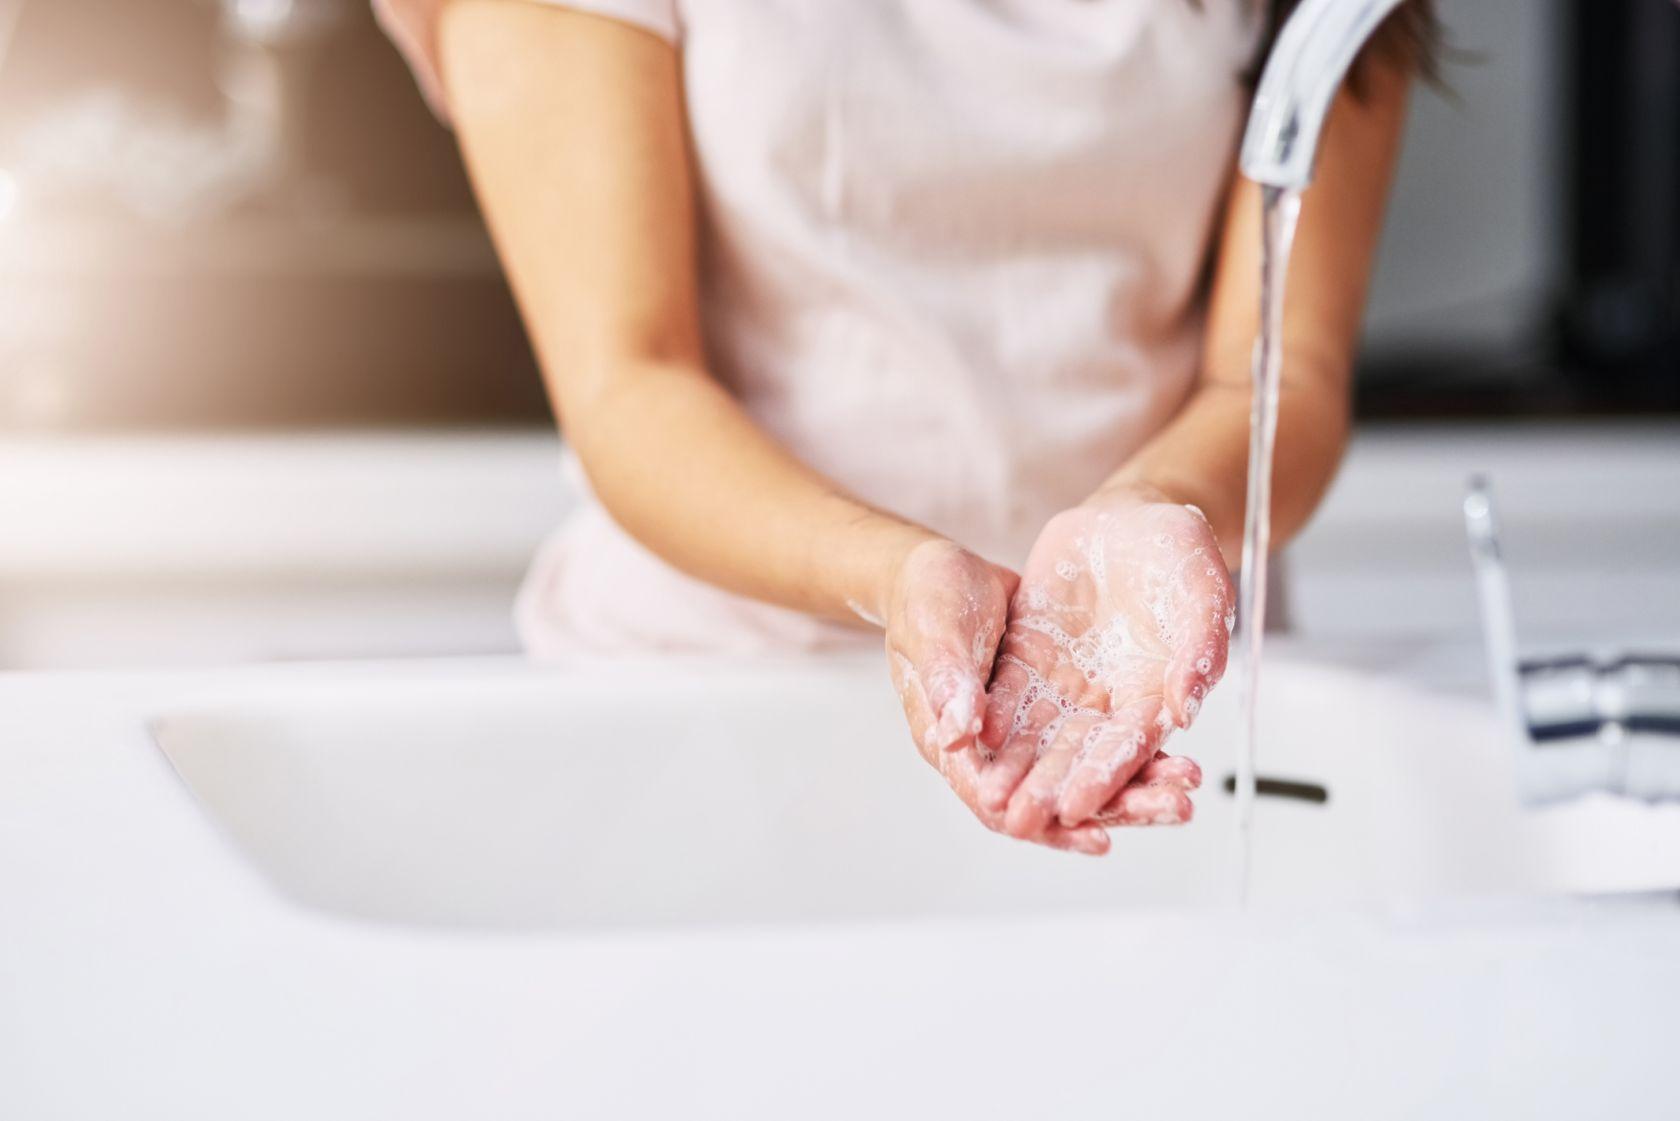 Homosexual hygiene